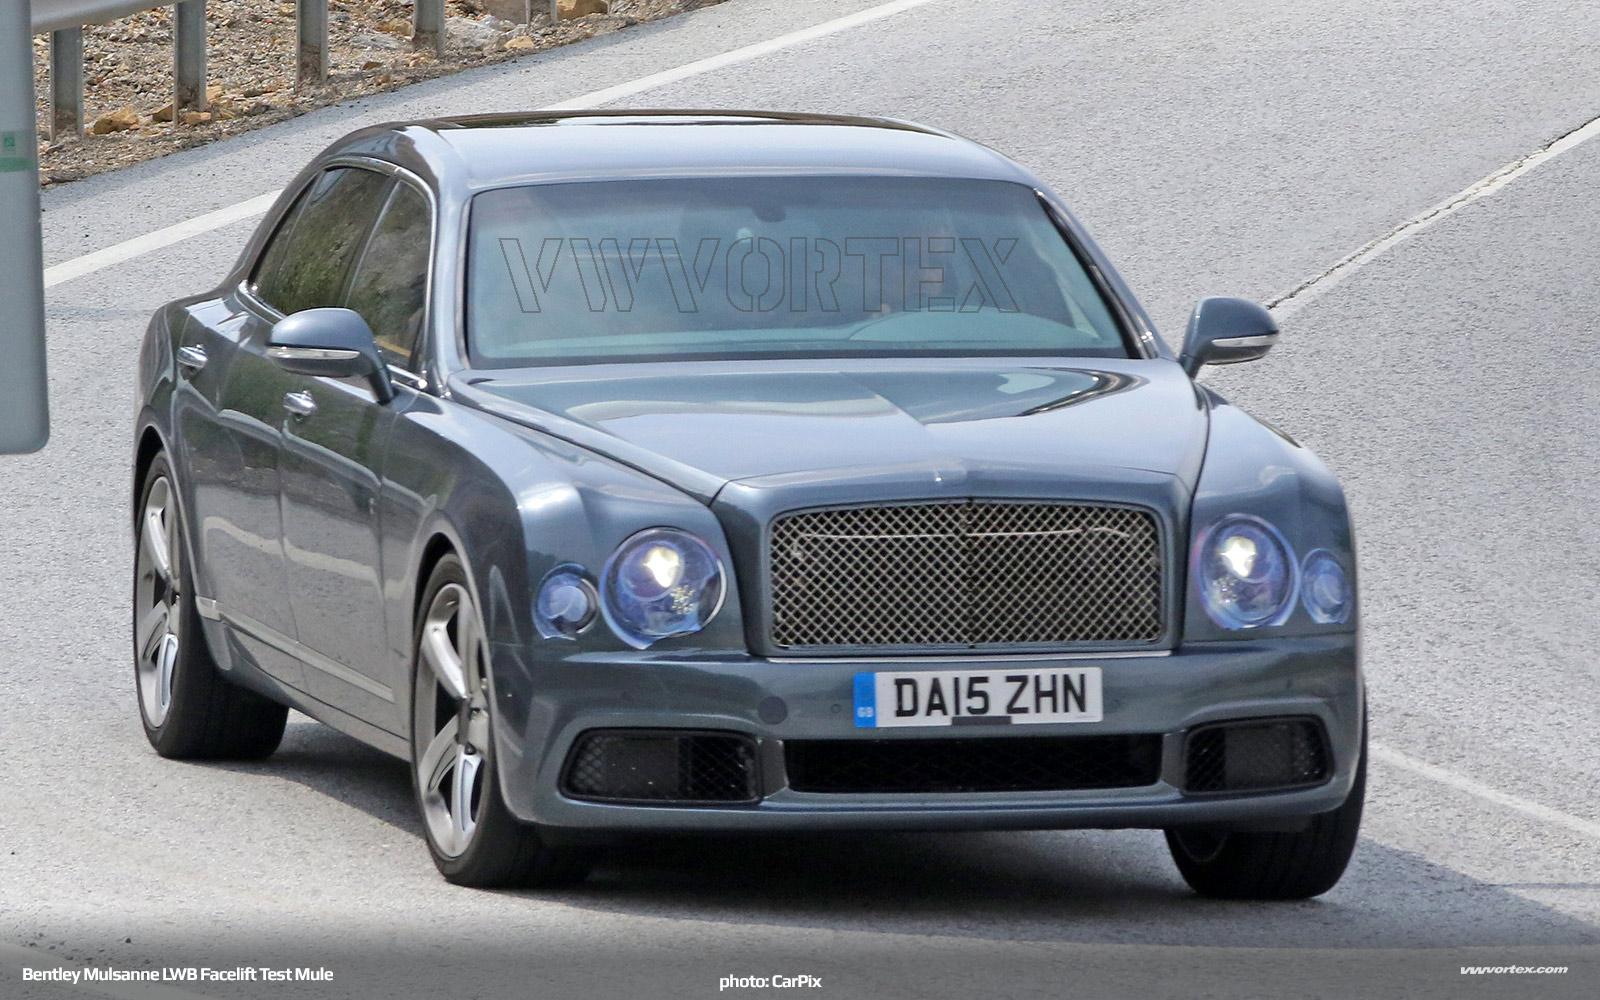 Bentley Mulsanne LWB test mule facelift 513 600x300